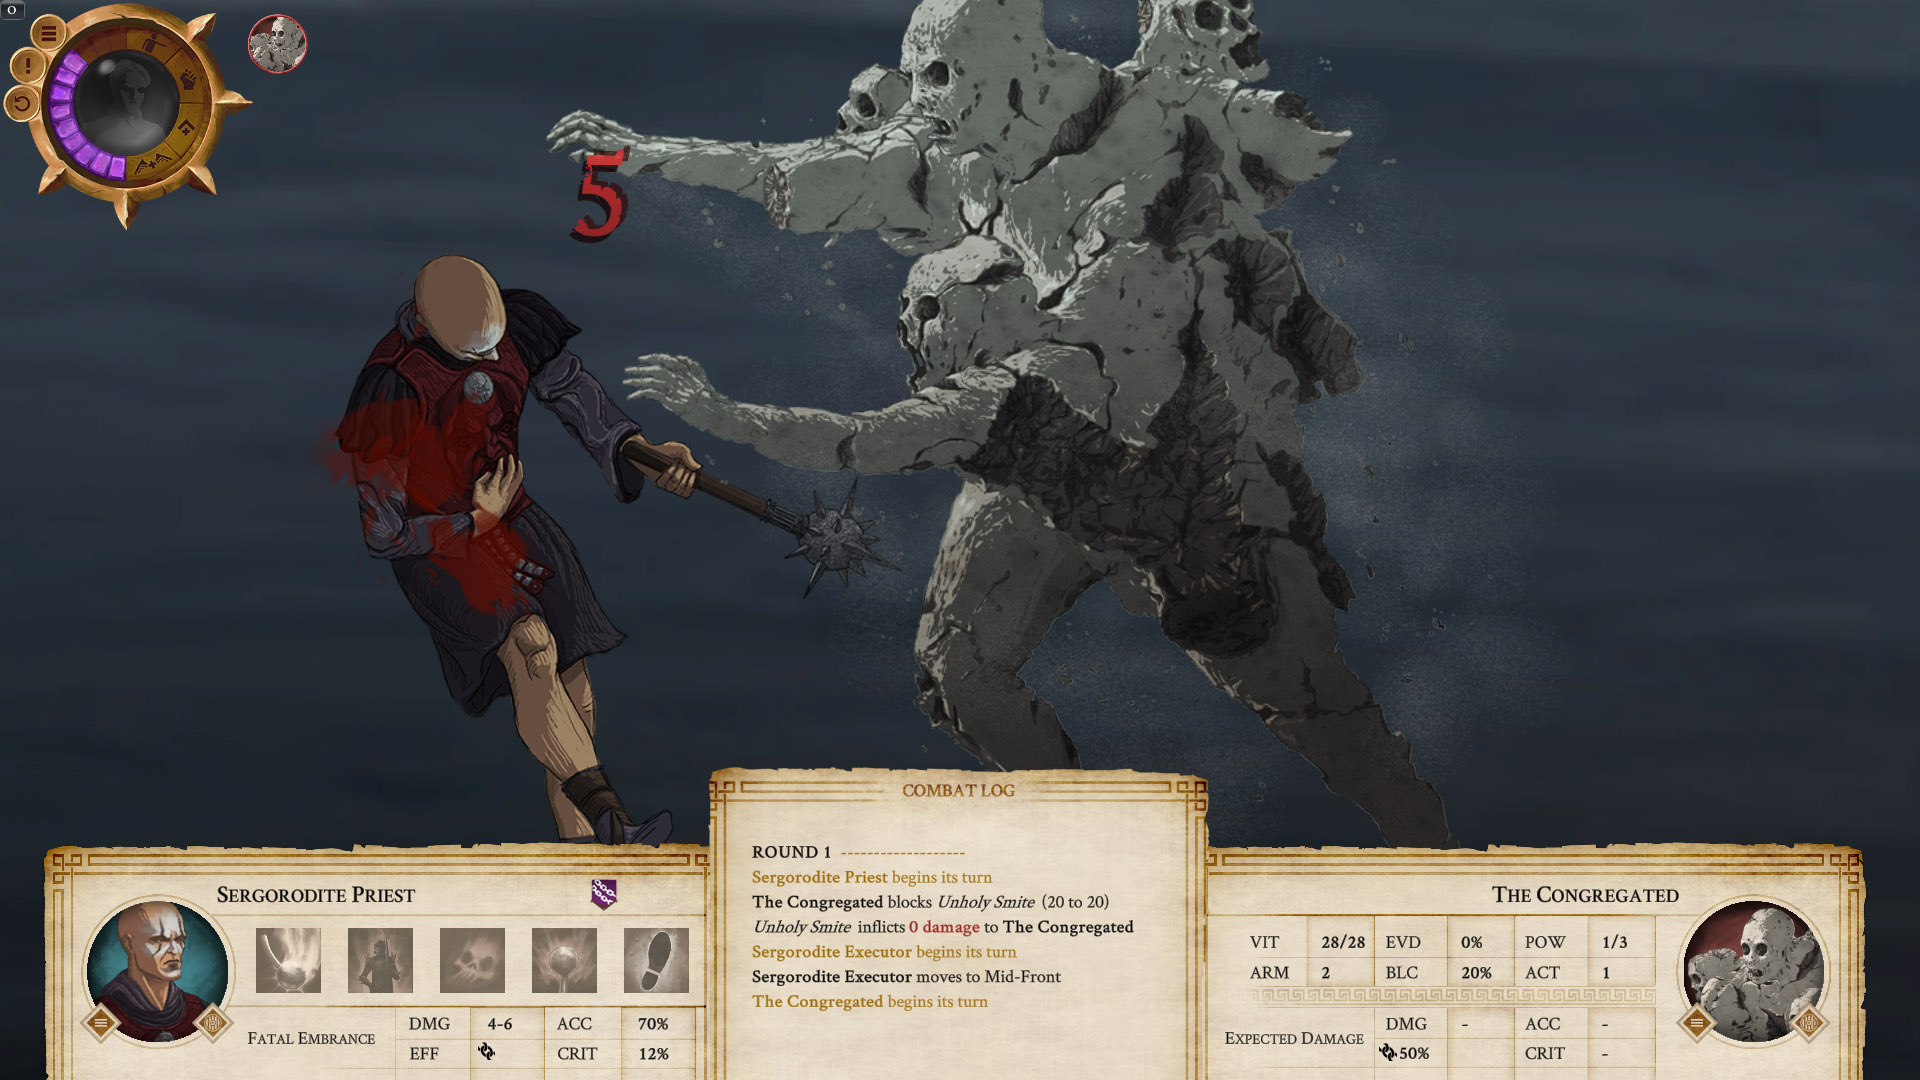 vagrus-centurion-edition-pc-screenshot-2